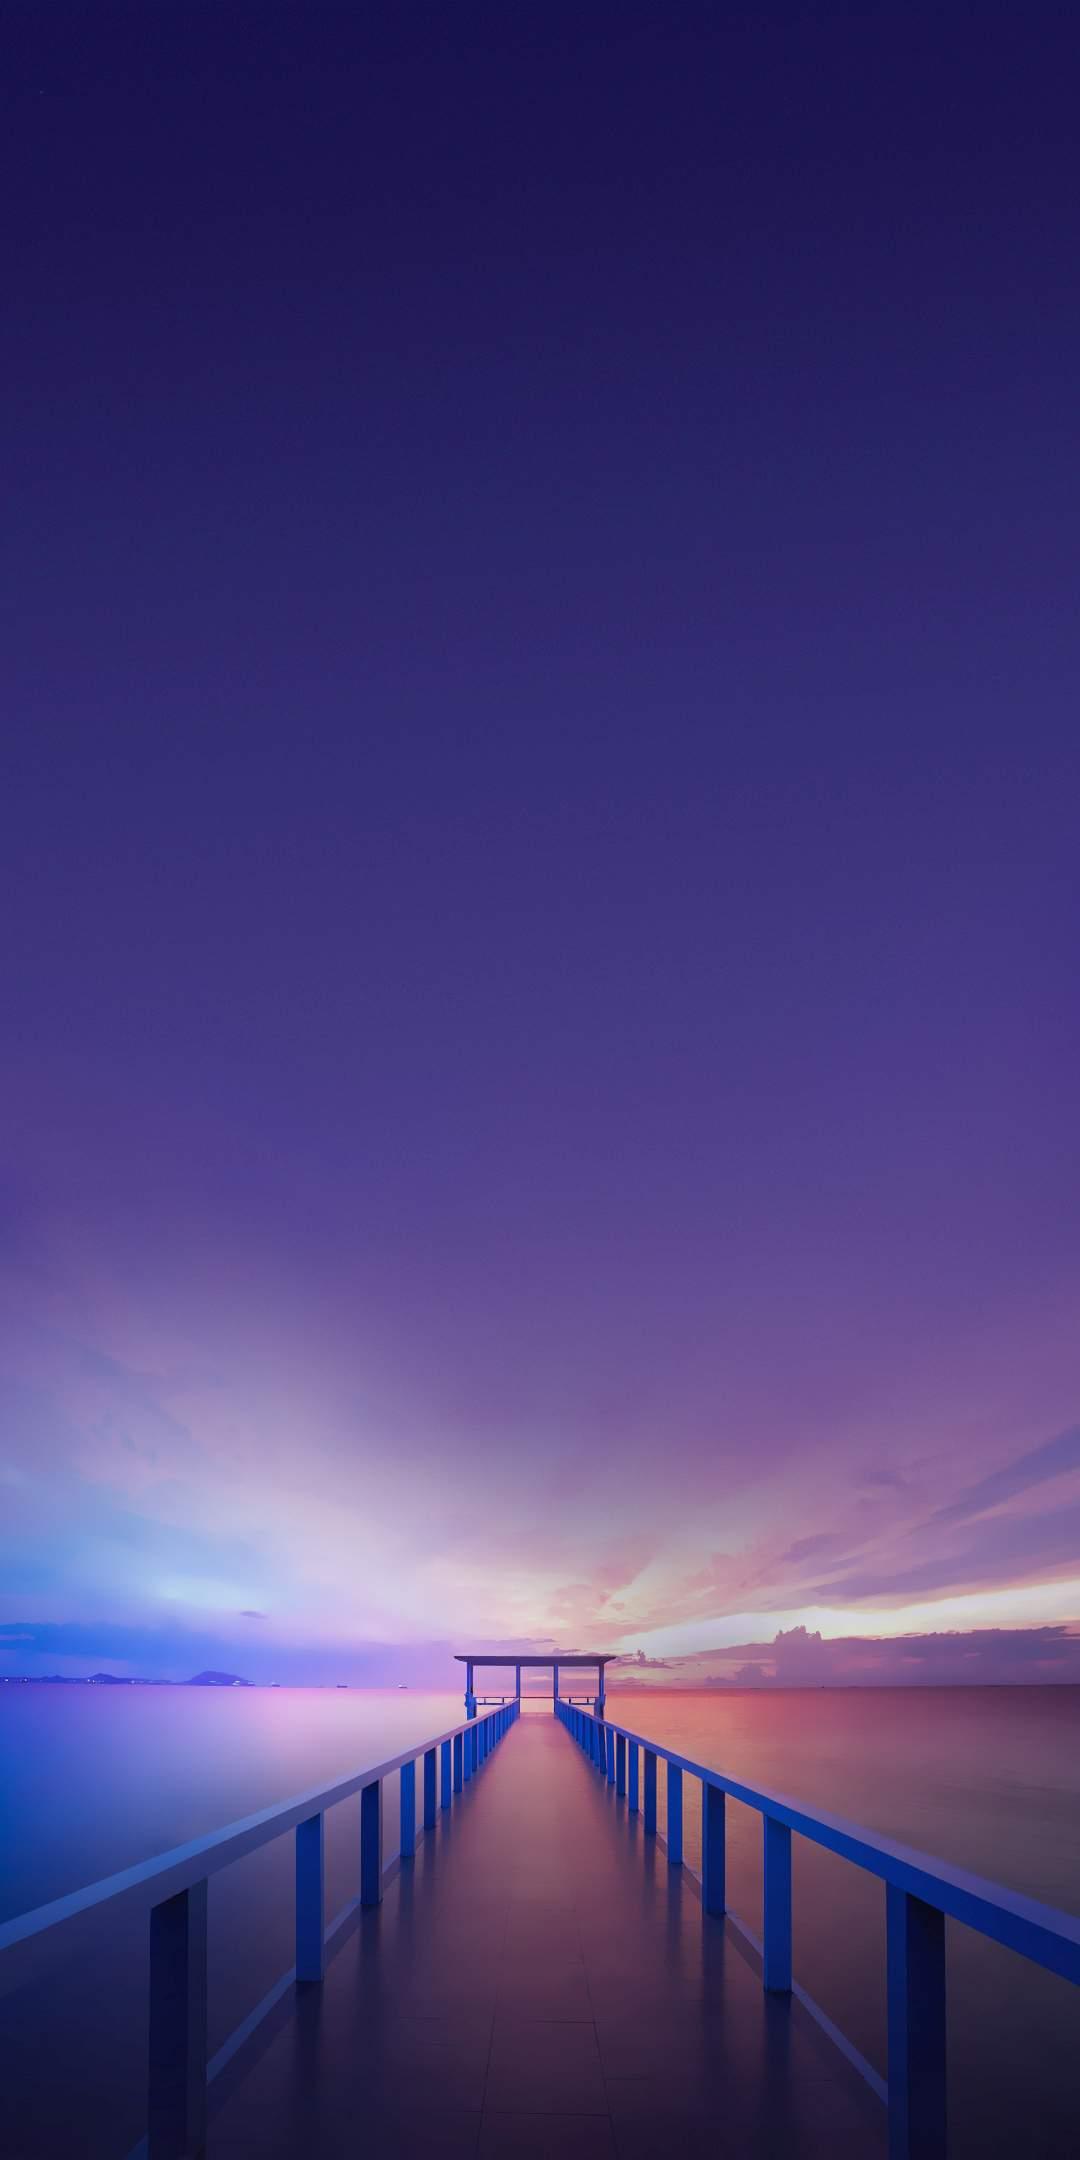 Ocean Bridge Pier Sunset Horizon iPhone Wallpaper